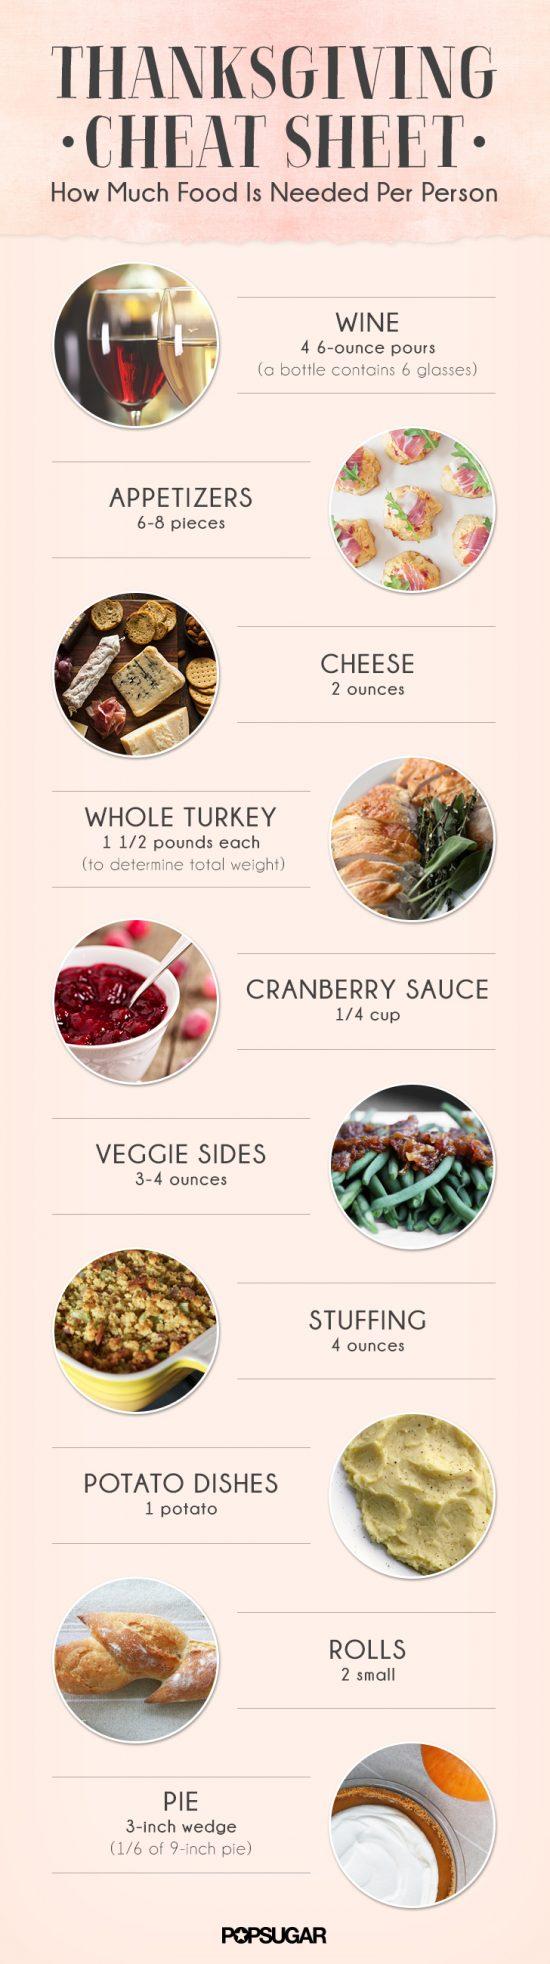 Food-Thankgiving-Cheat-Sheet